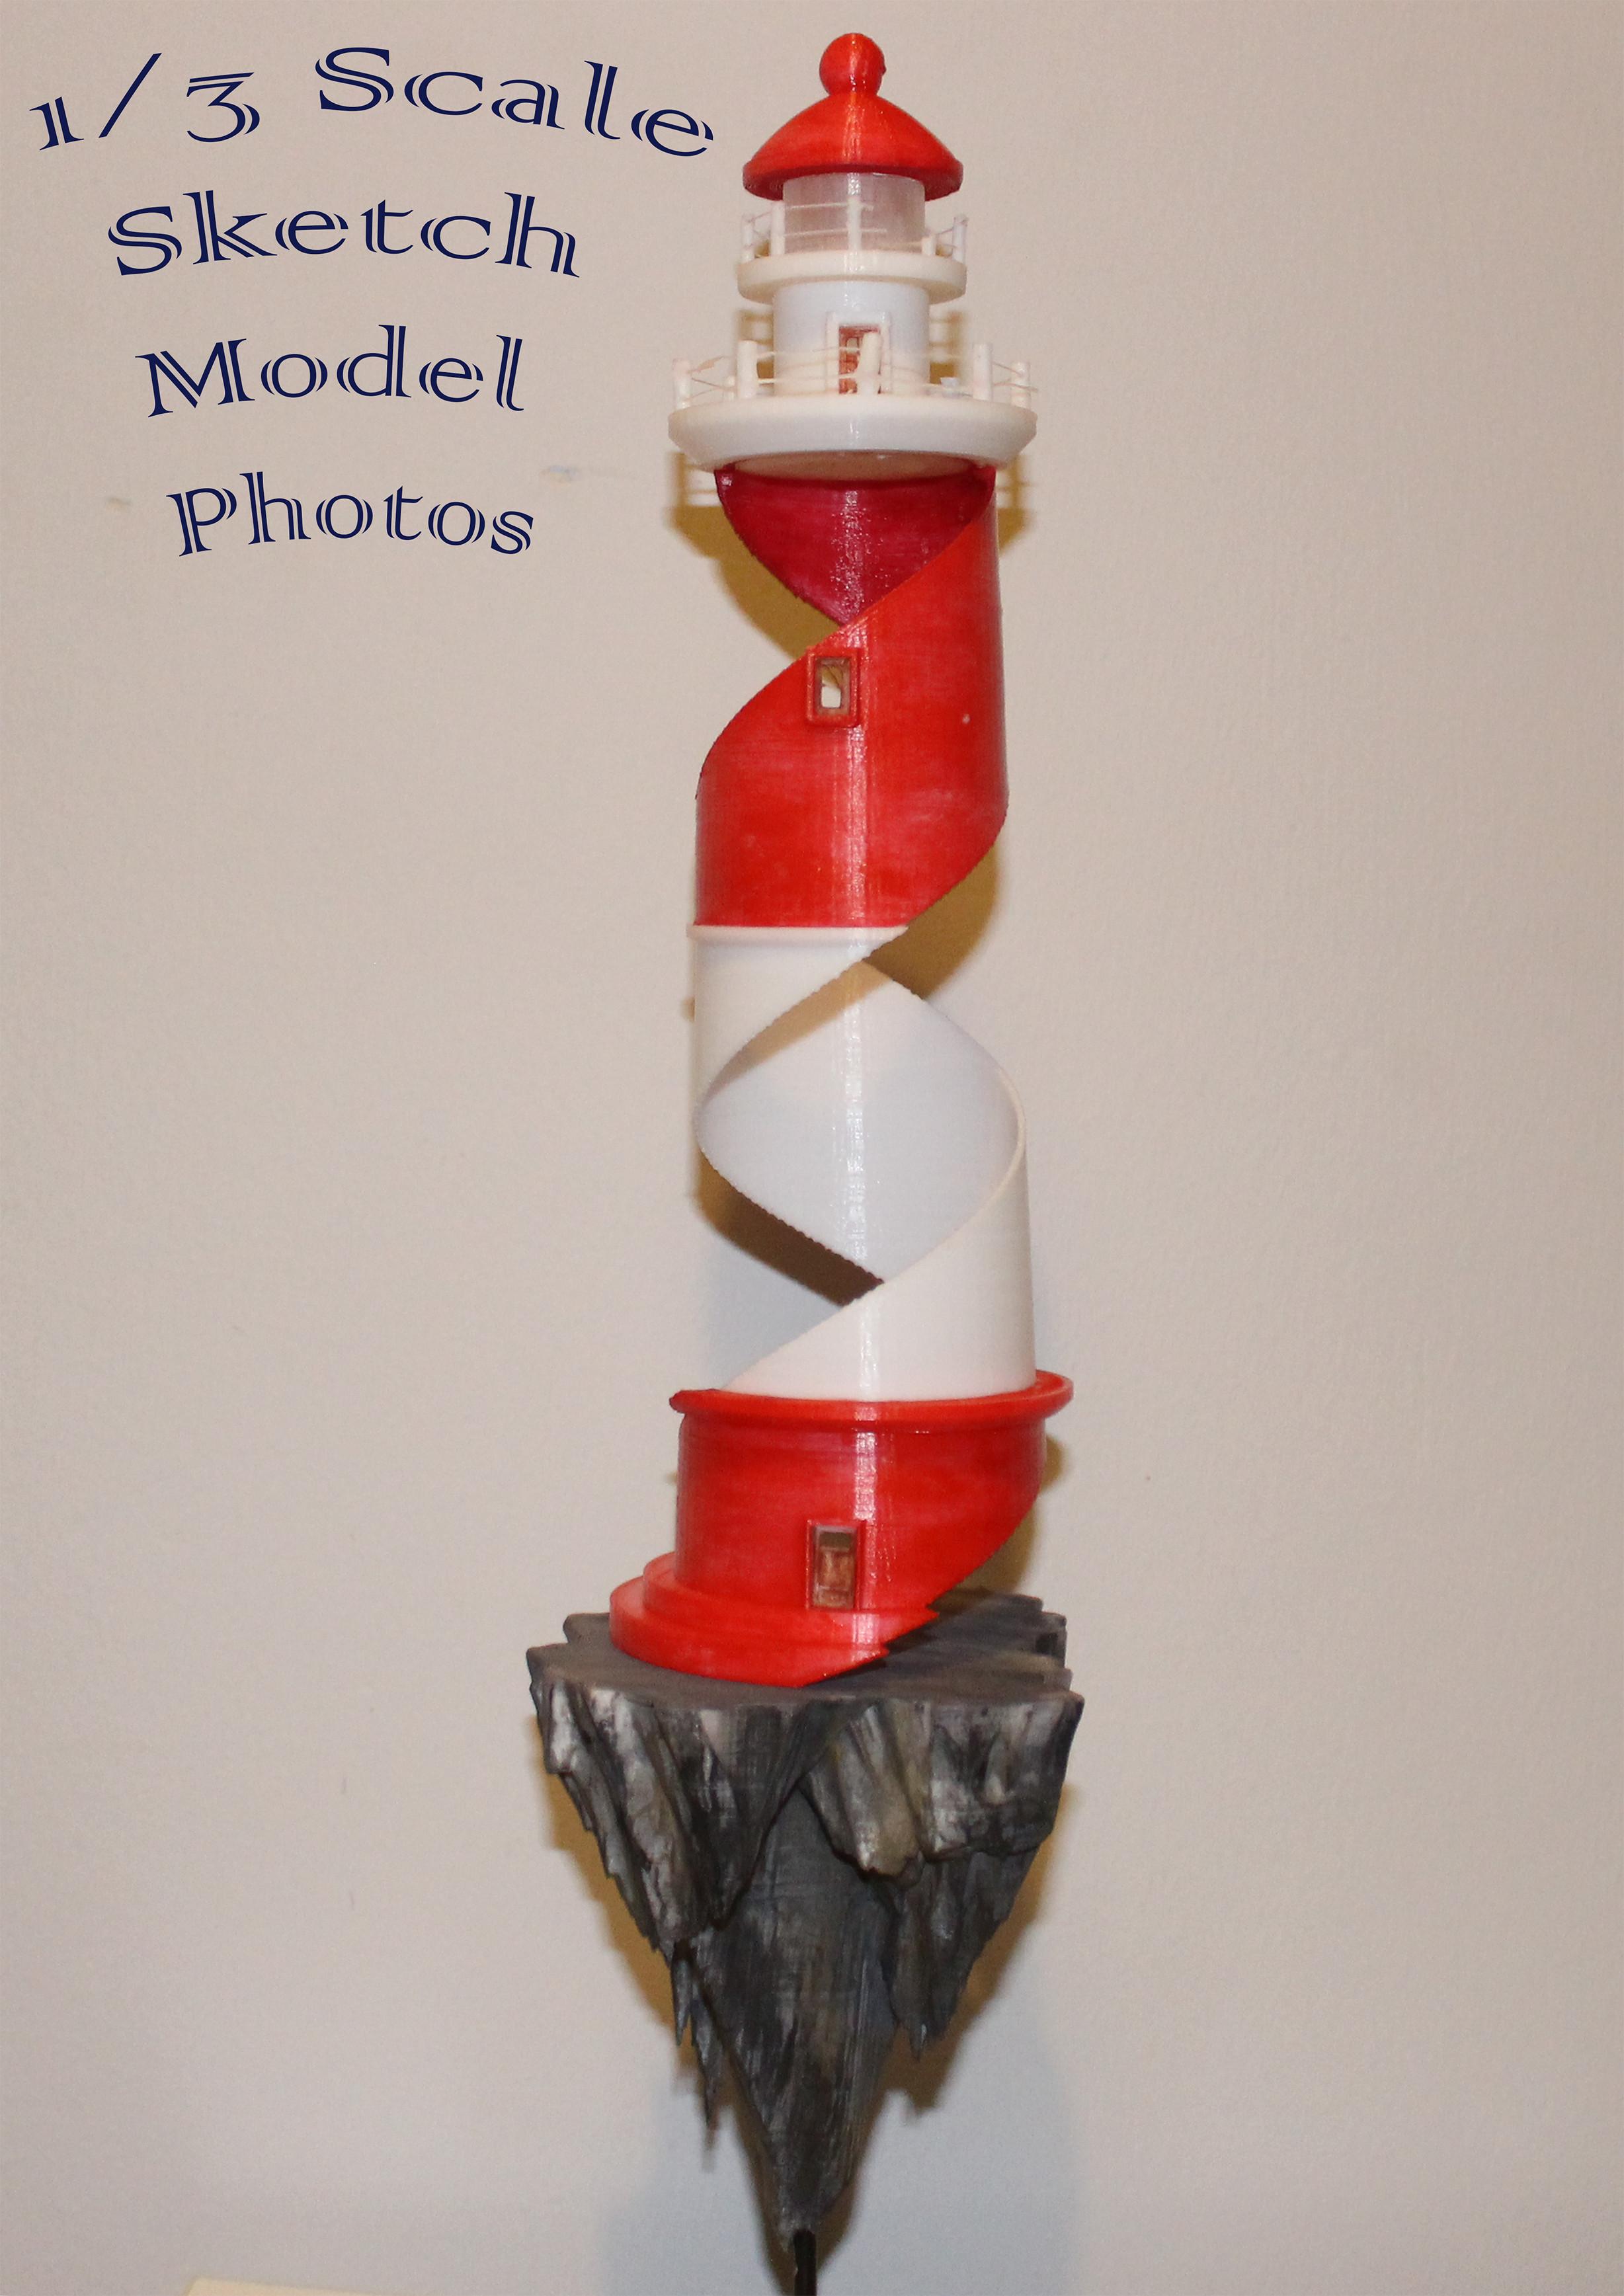 1/3 Scale Sketch Model